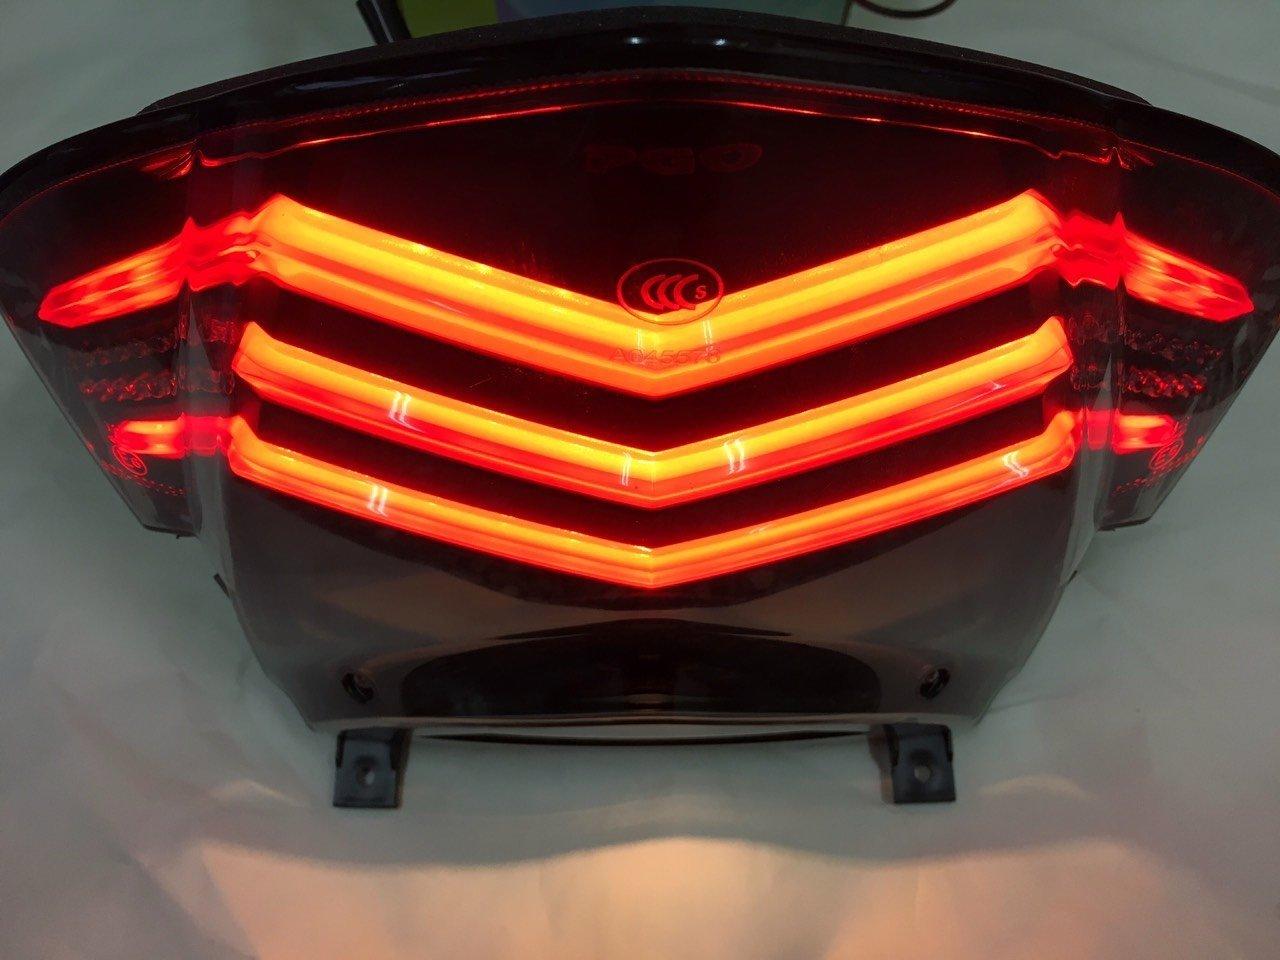 【YST】彪虎 PGO TIGRA 150 ABS 紅底 LED 導光 尾燈 總成 彪虎 125彪虎 150 小燈。